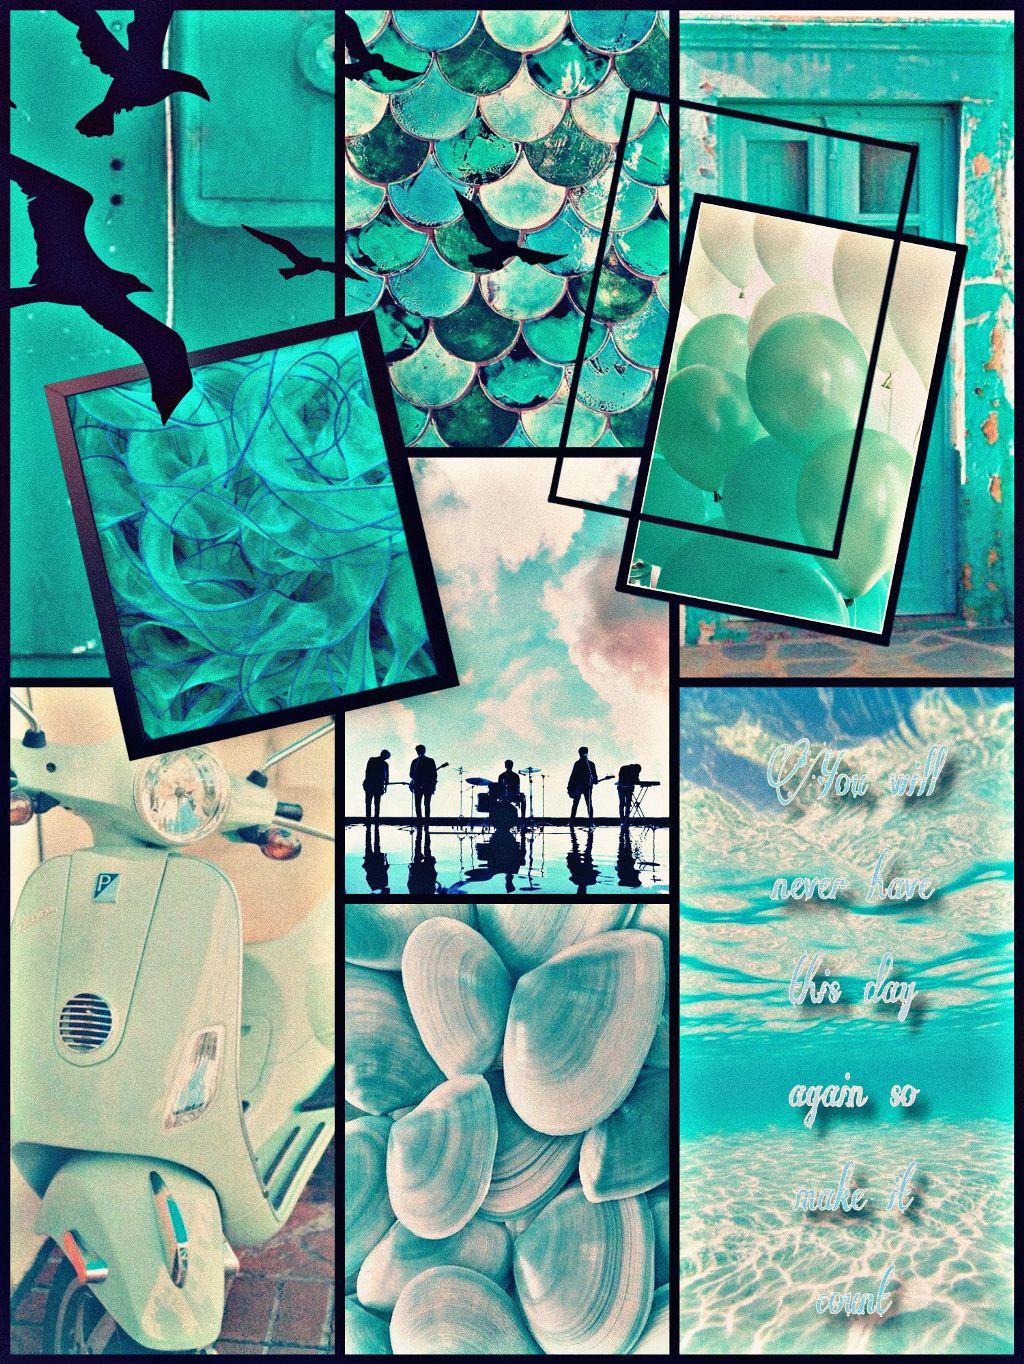 #aqua #asthetic #korea #day6 #krock #freetoedit #water #ocean #seashell #balloon #lace #door